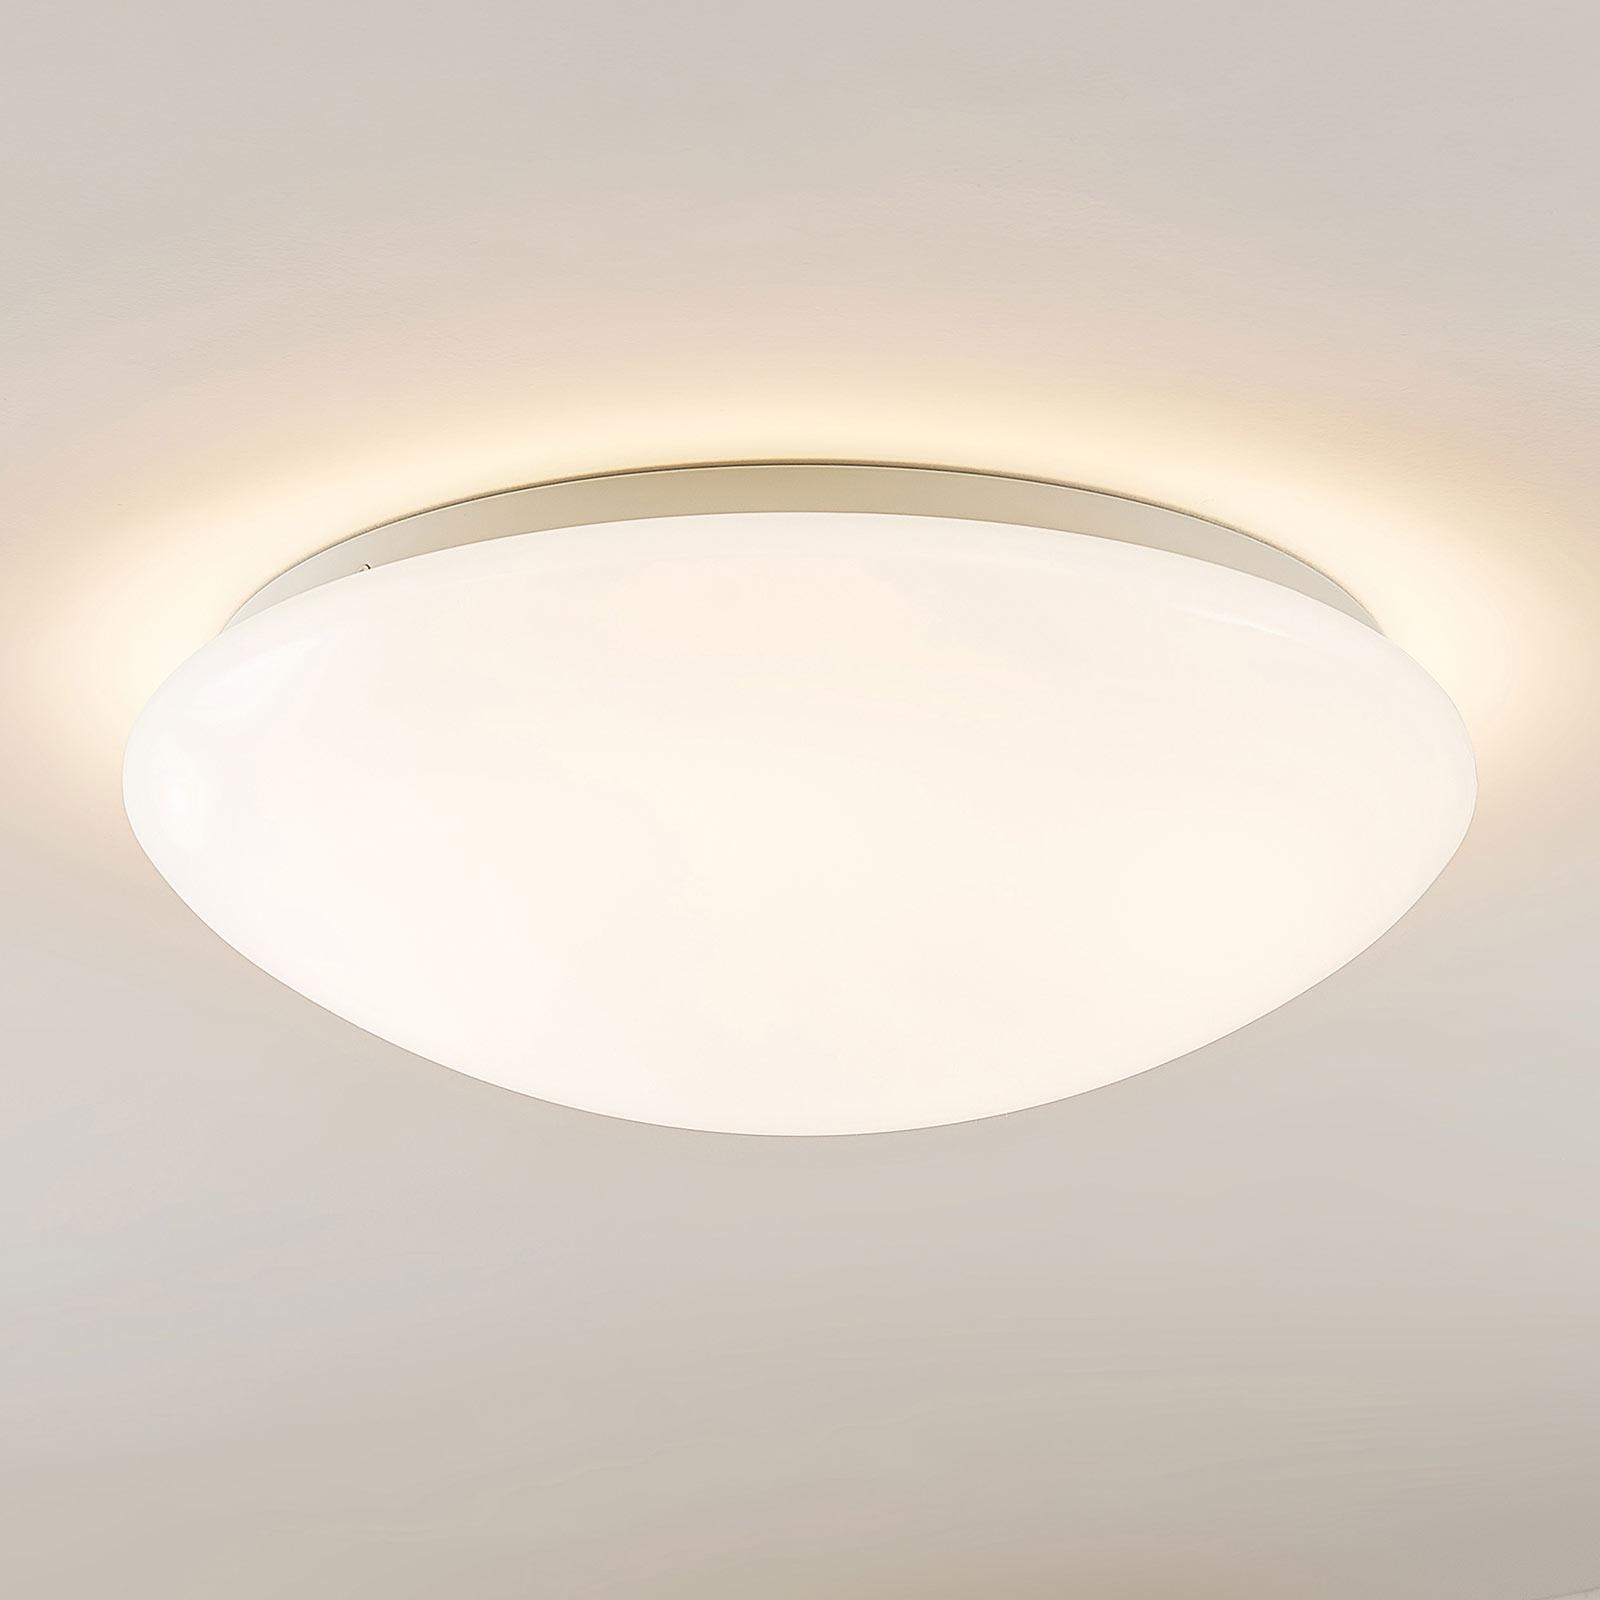 Arcchio Younes LED-taklampe, hvit, rund, 40 cm